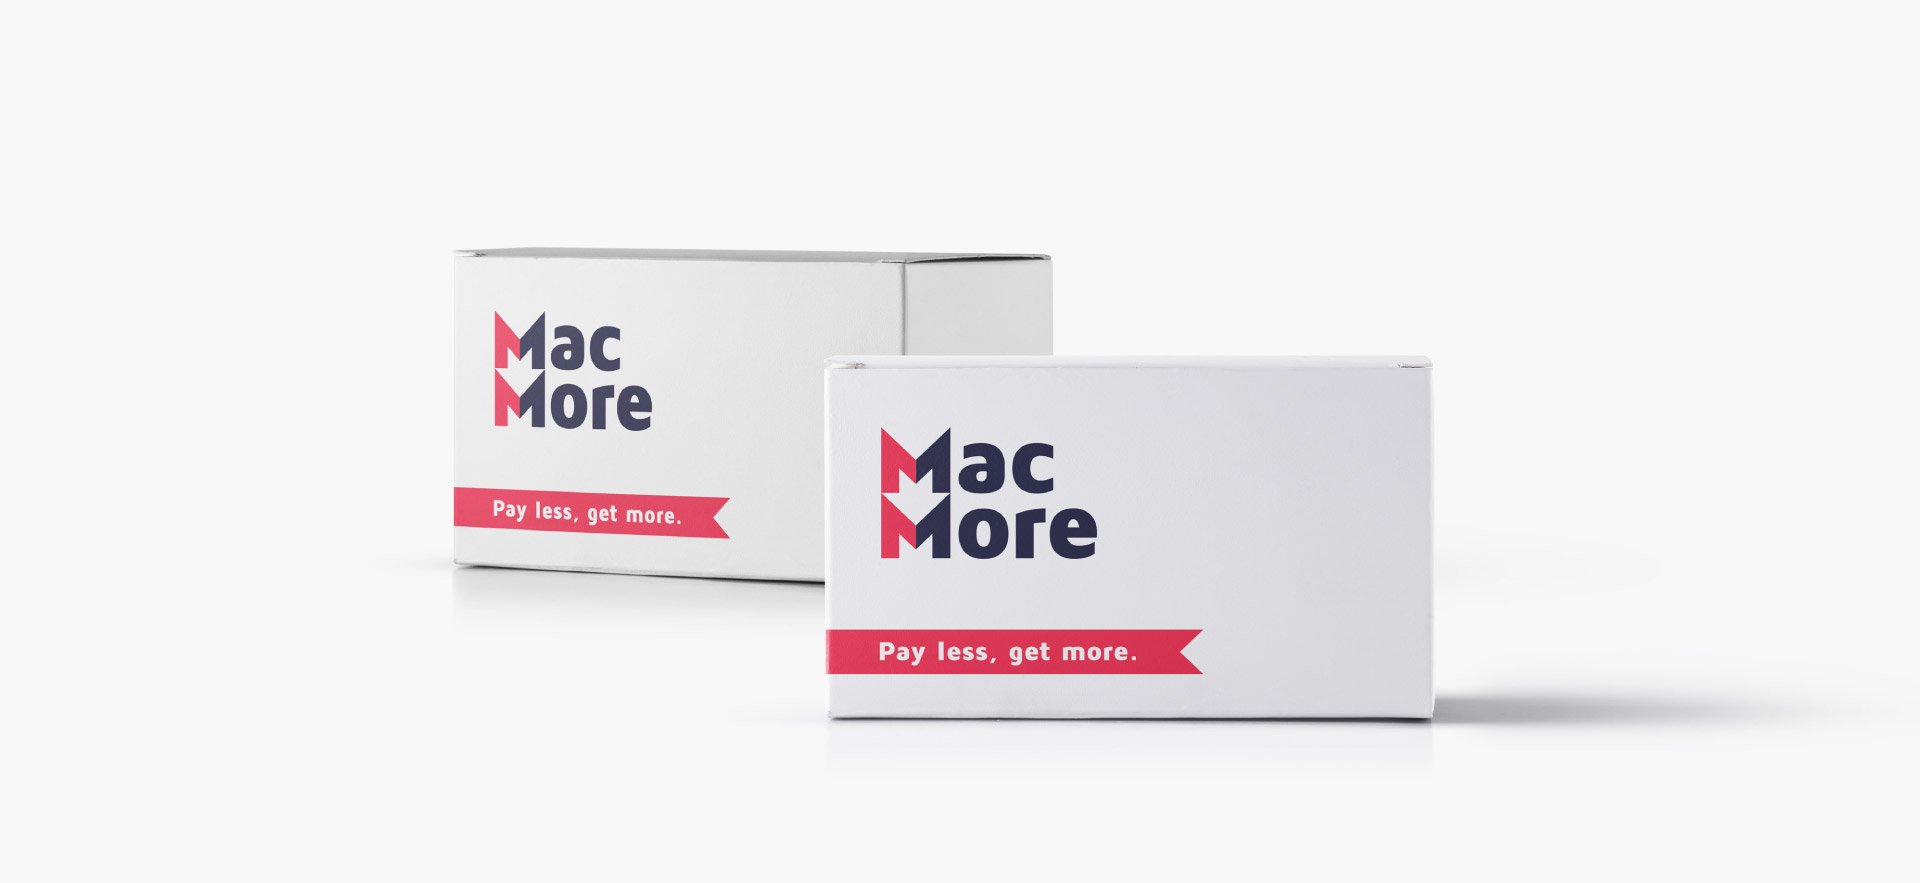 MacMore opakowanie, pudełka z logo